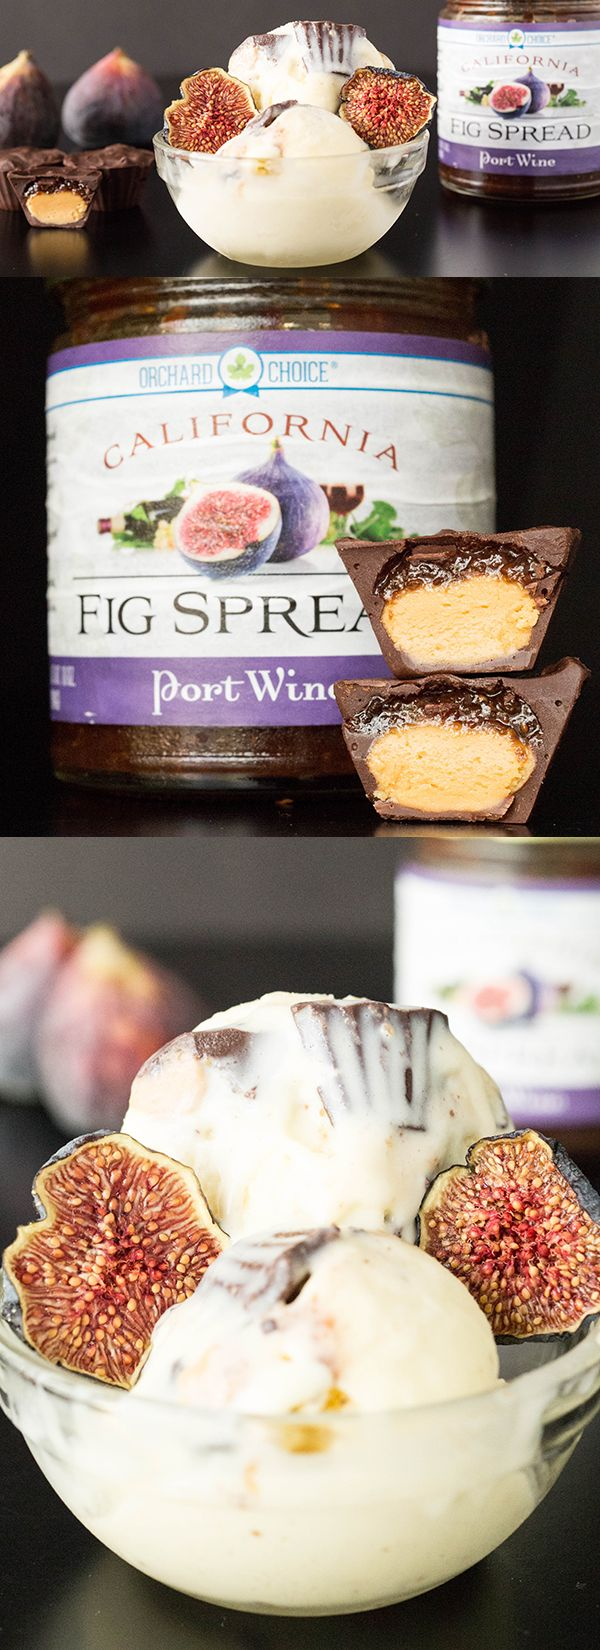 Homemade Mascarpone Ice Cream with Almond Butter & Fig Jam Cups - Ice Cream Recipes